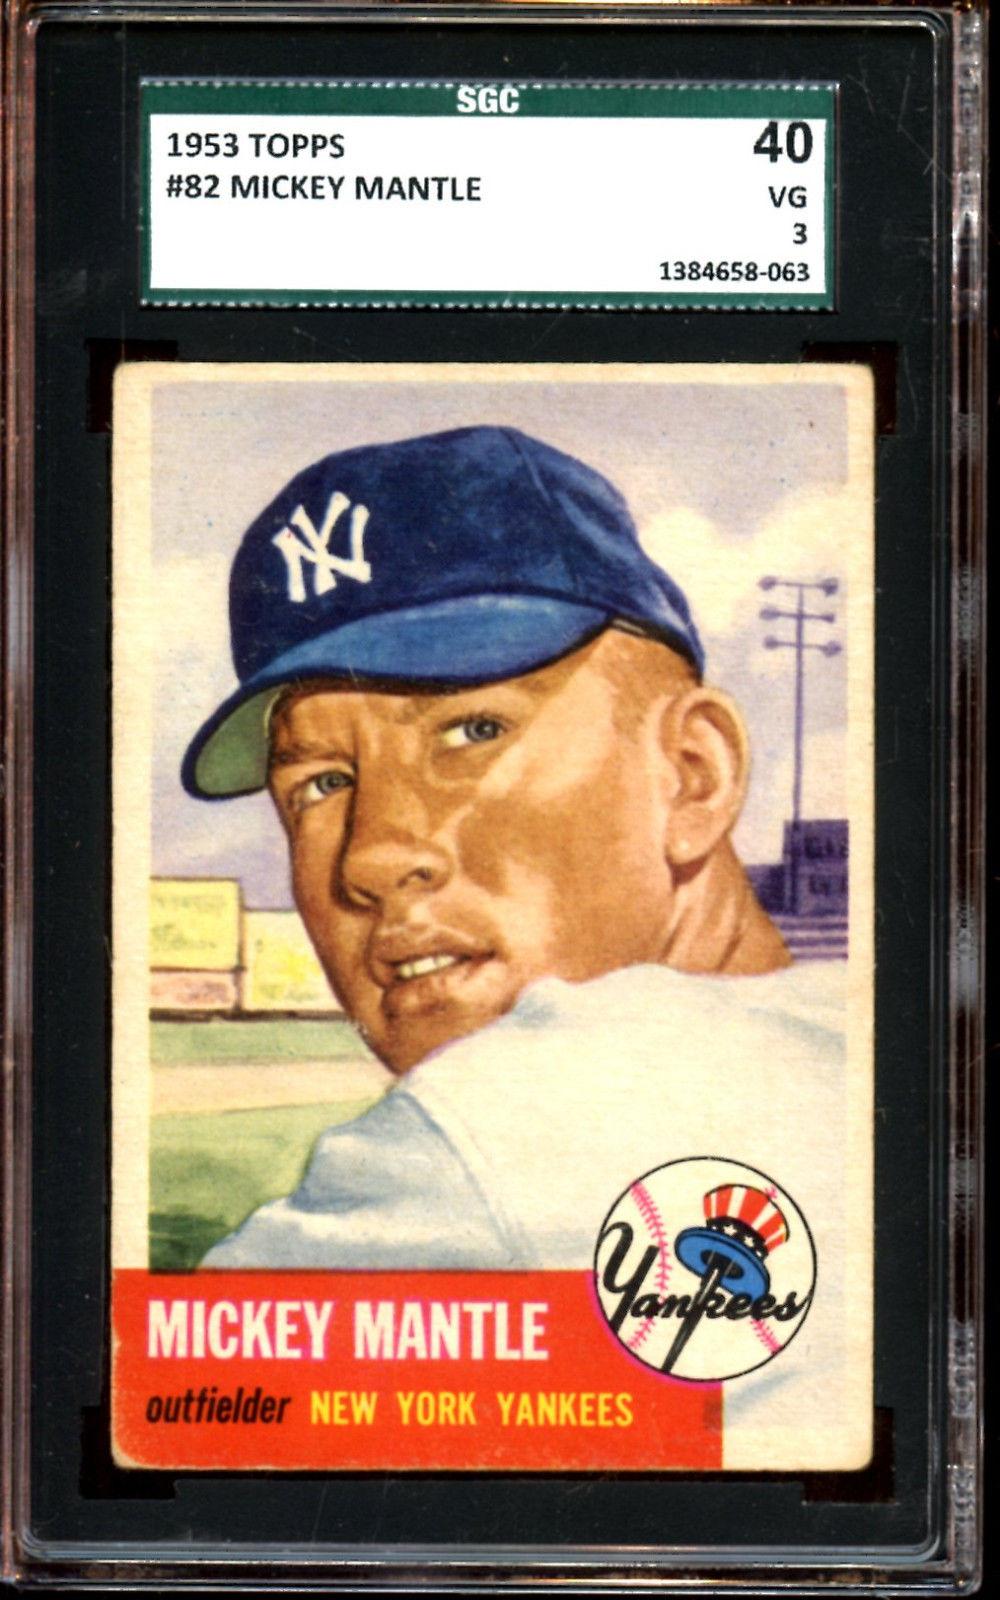 1953 Topps Baseball Card 82 Mickey Mantle New York Yankees SGC 40 VG 3